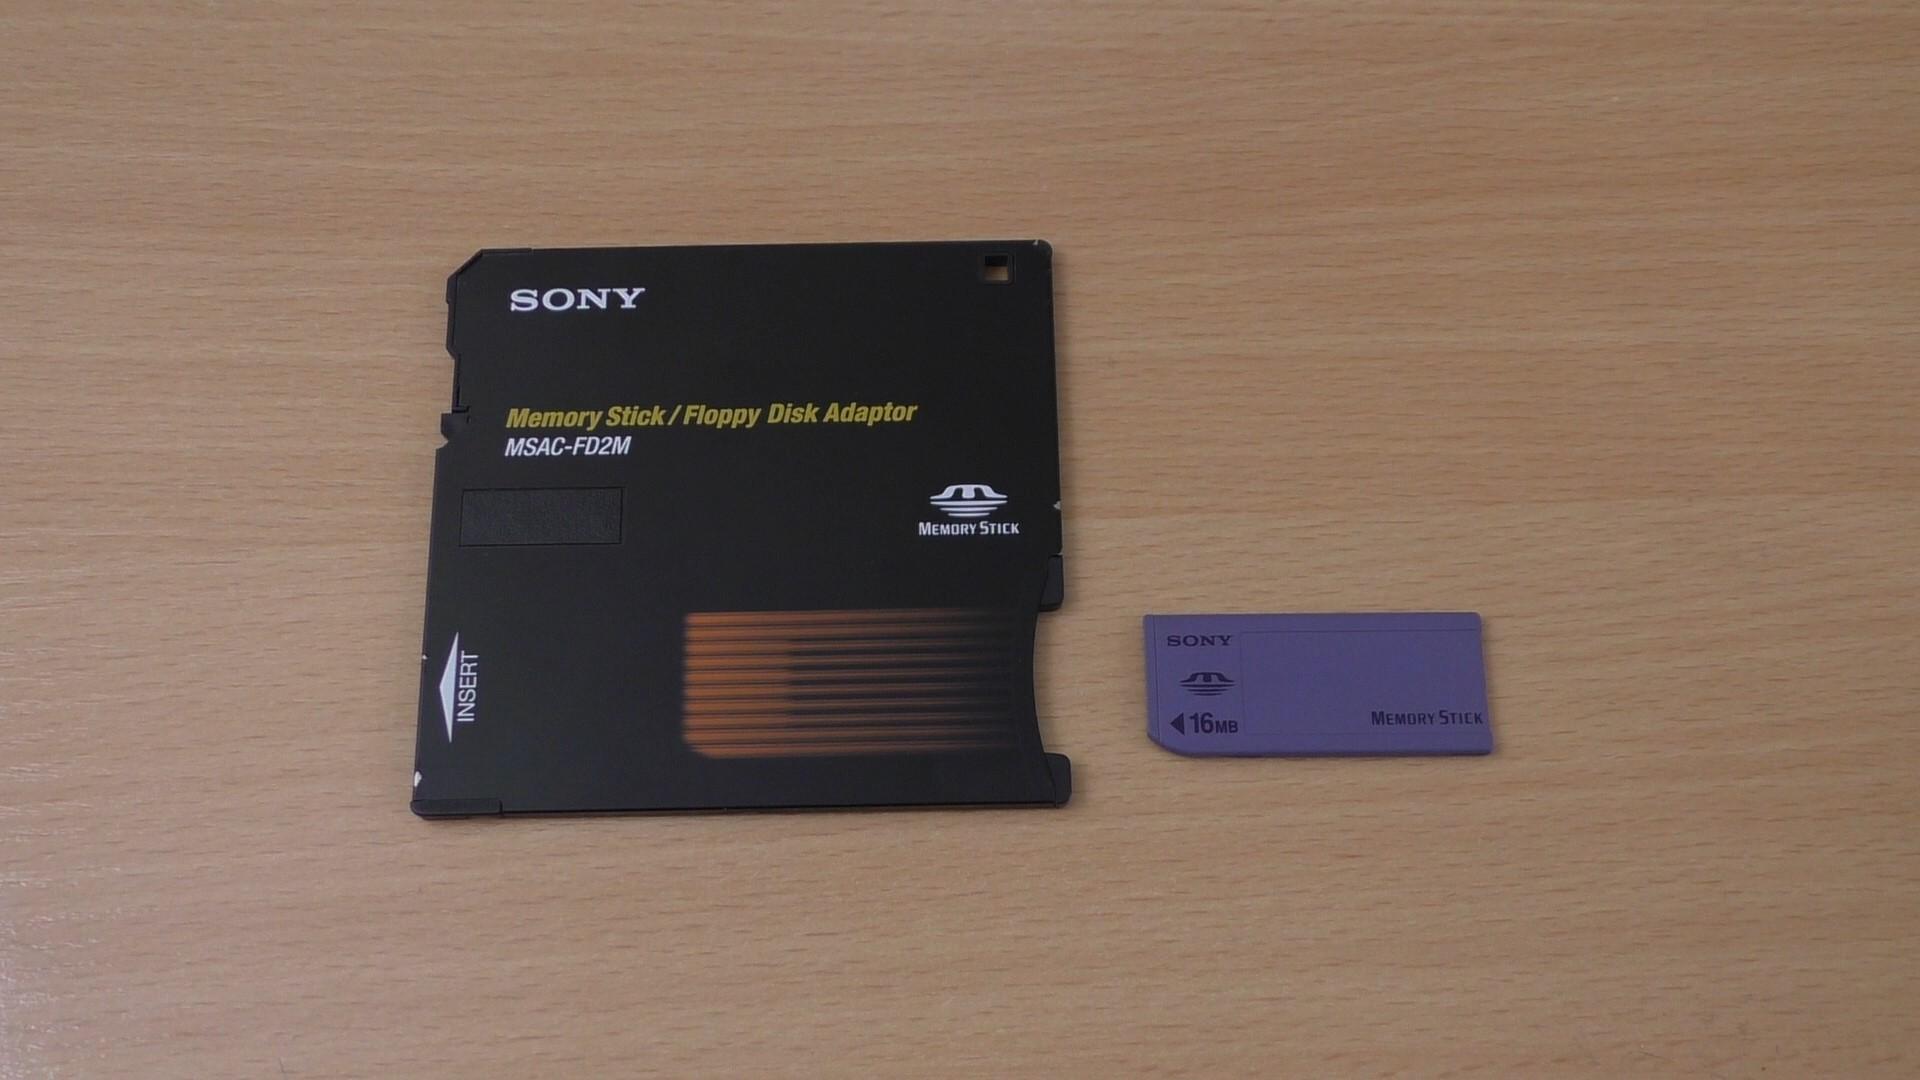 Фотоаппарат на дискетах: 8 интересных фактов о Sony Mavica MVC-FD85 (много картинок) - 22